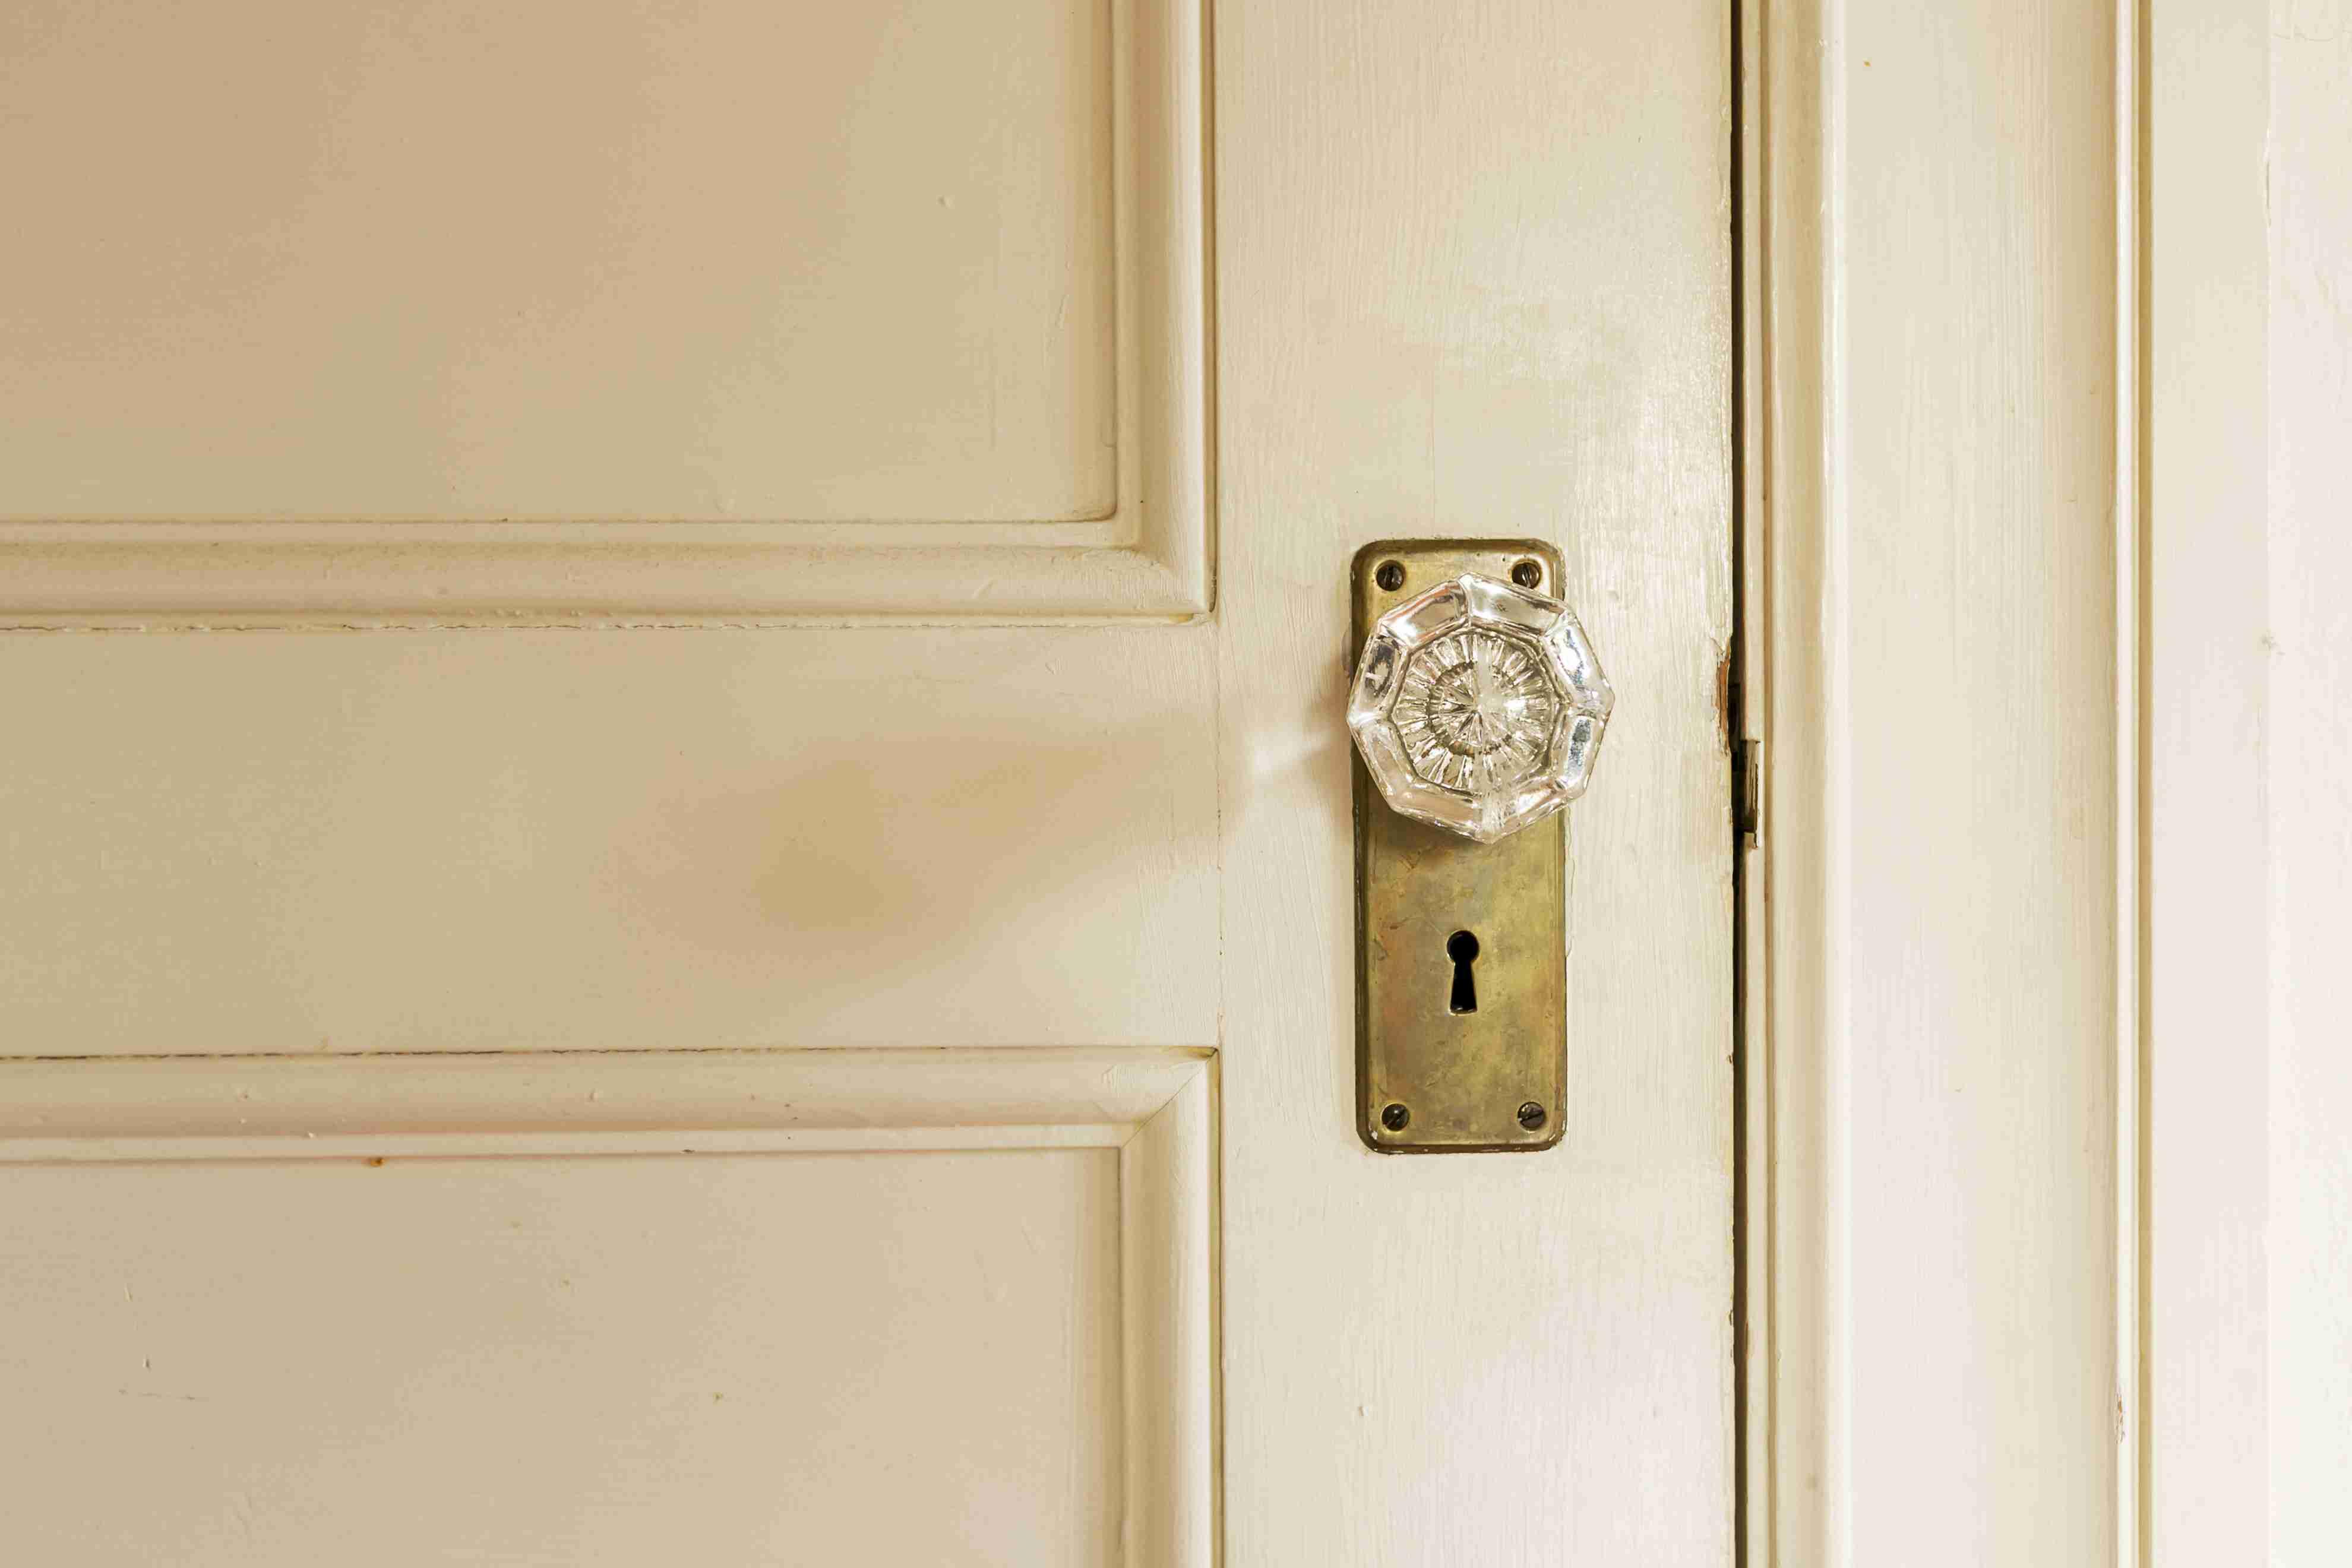 crystal door knob on a cream-colored door